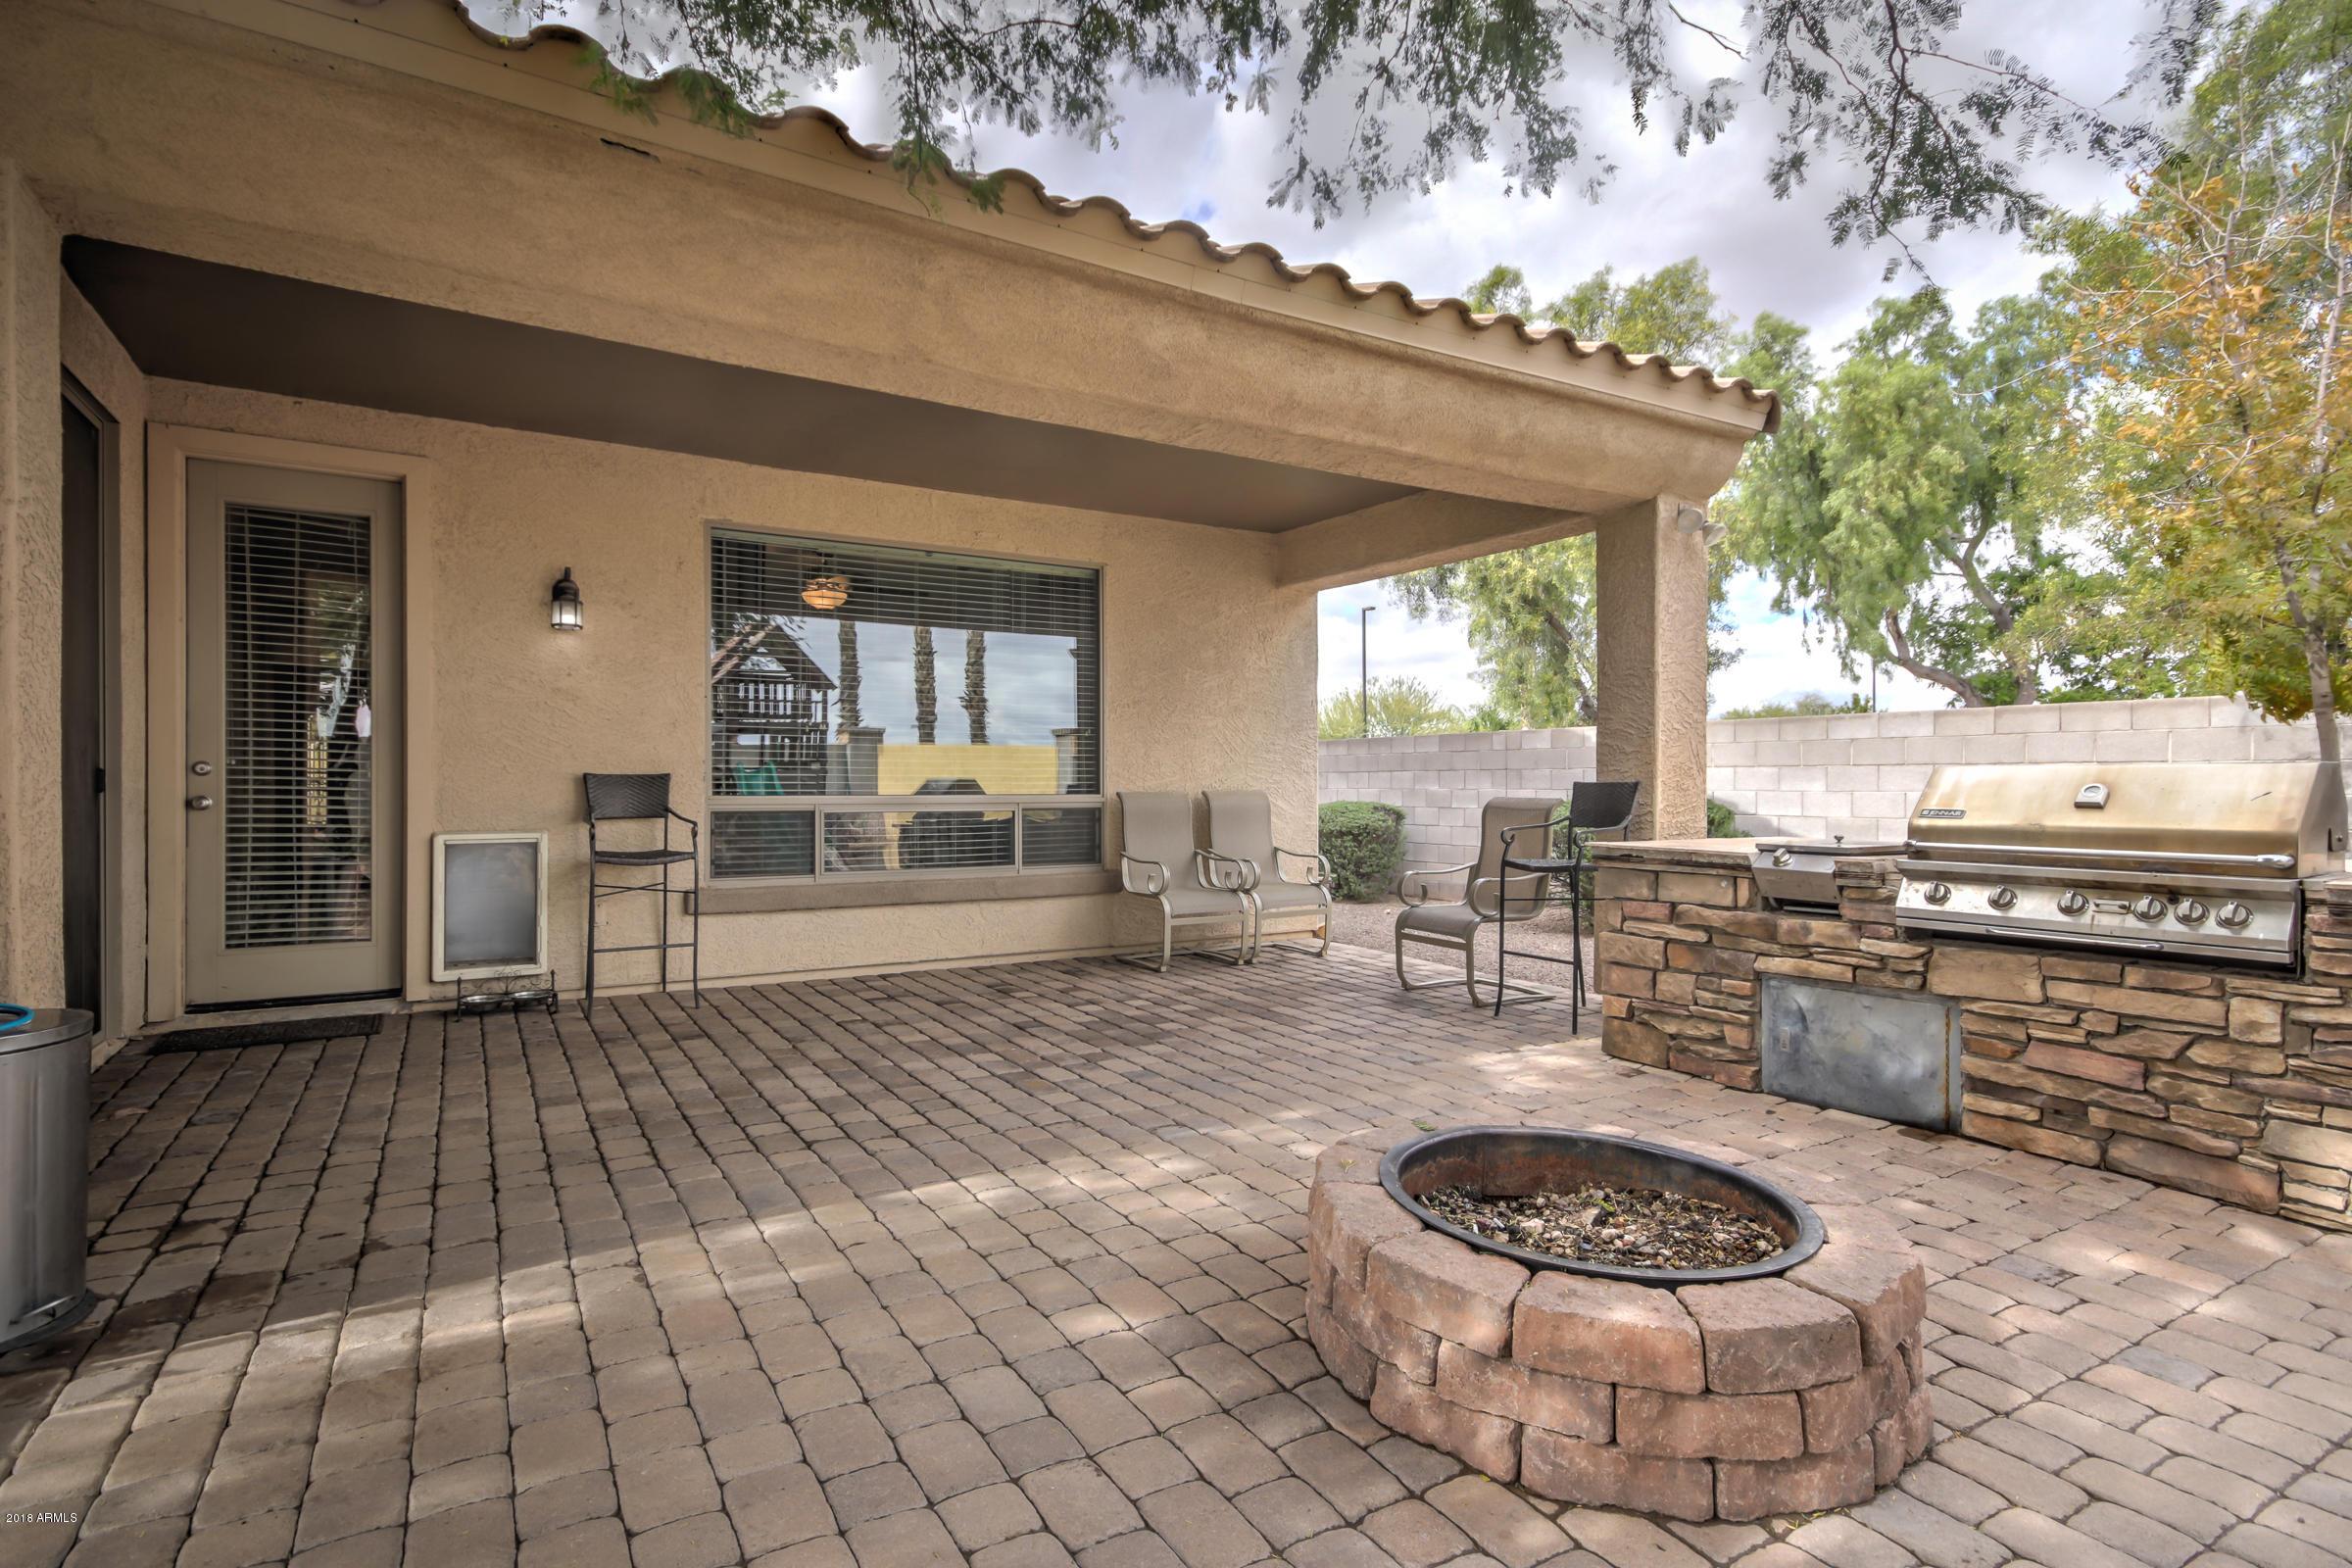 MLS 5853813 4549 S REDROCK Street, Gilbert, AZ 85297 Gilbert AZ Estates At The Spectrum